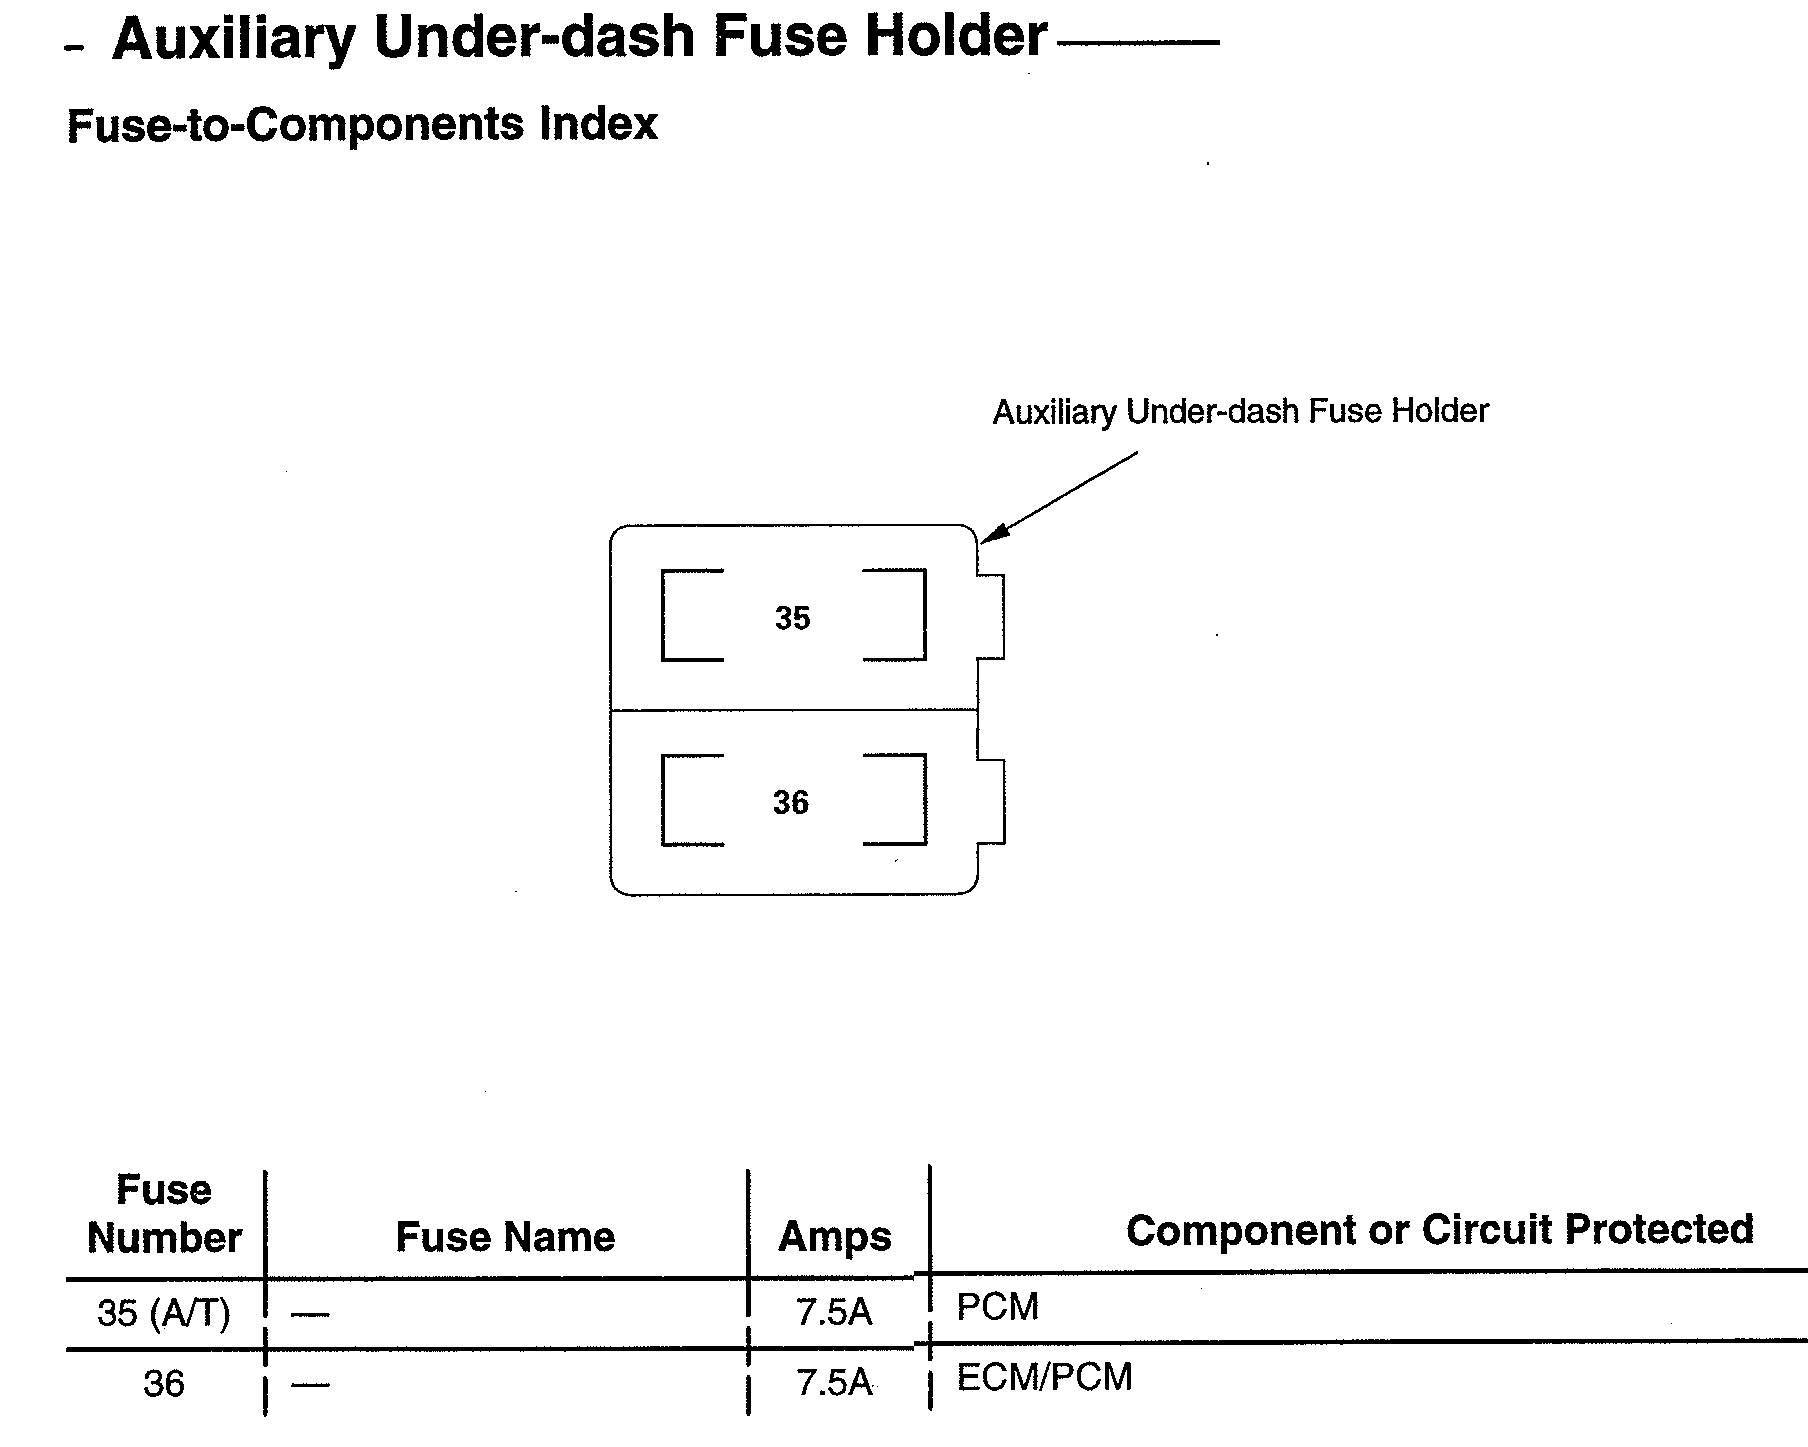 fuse board wiring diagram domestic kawasaki bayou 220 parts diagrams acura tl 2008 panel carknowledge